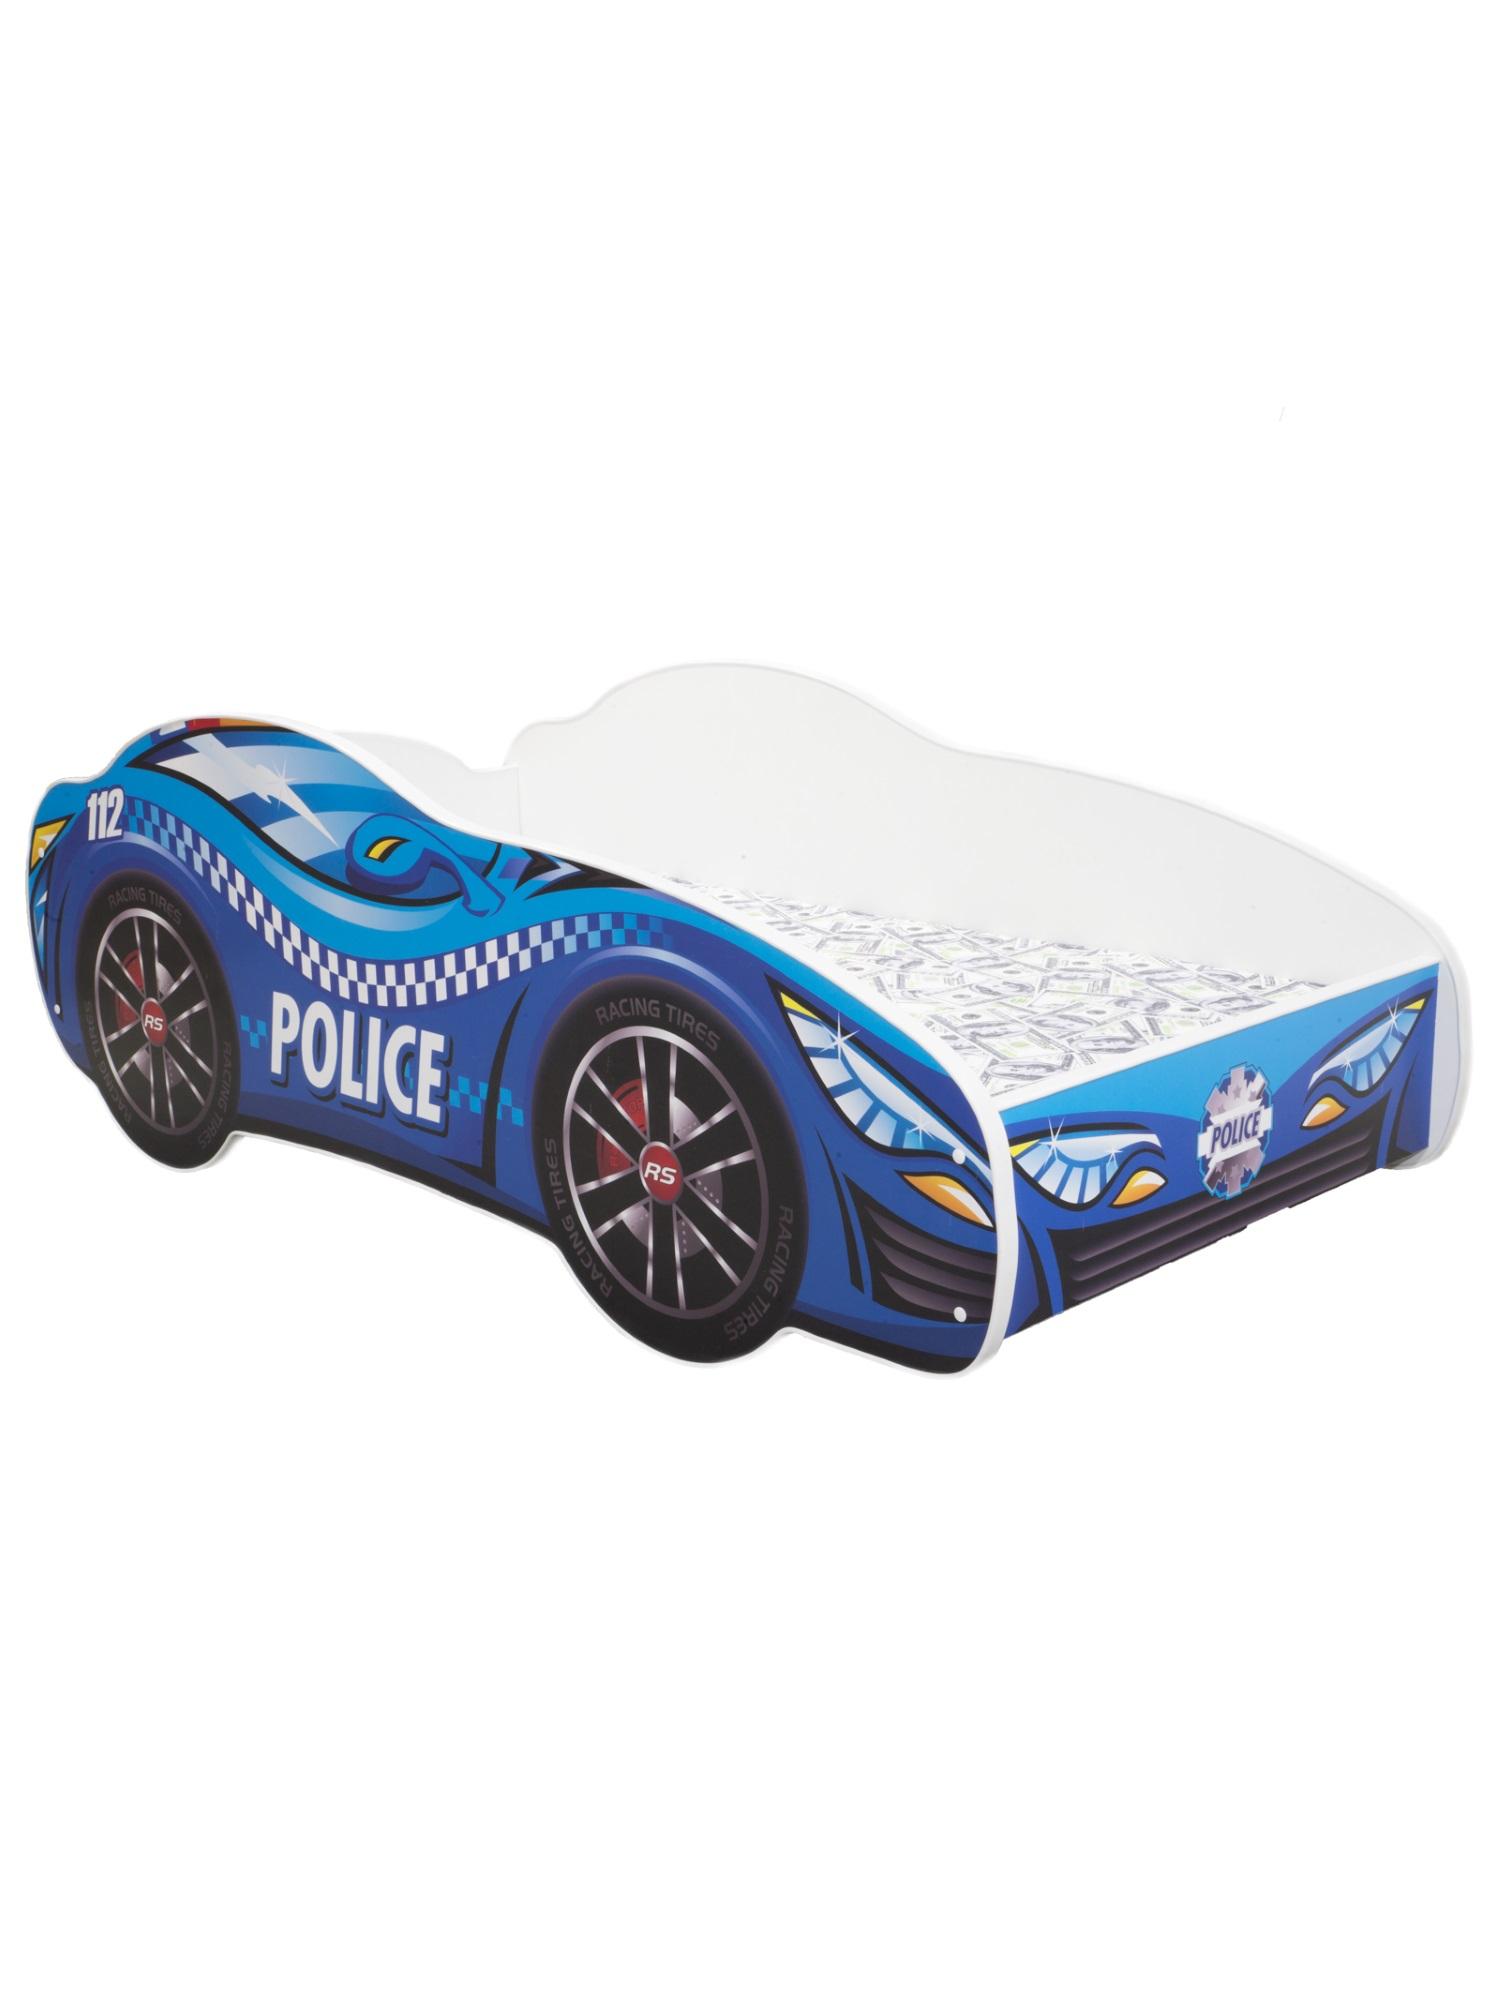 Racing Car Police – 01